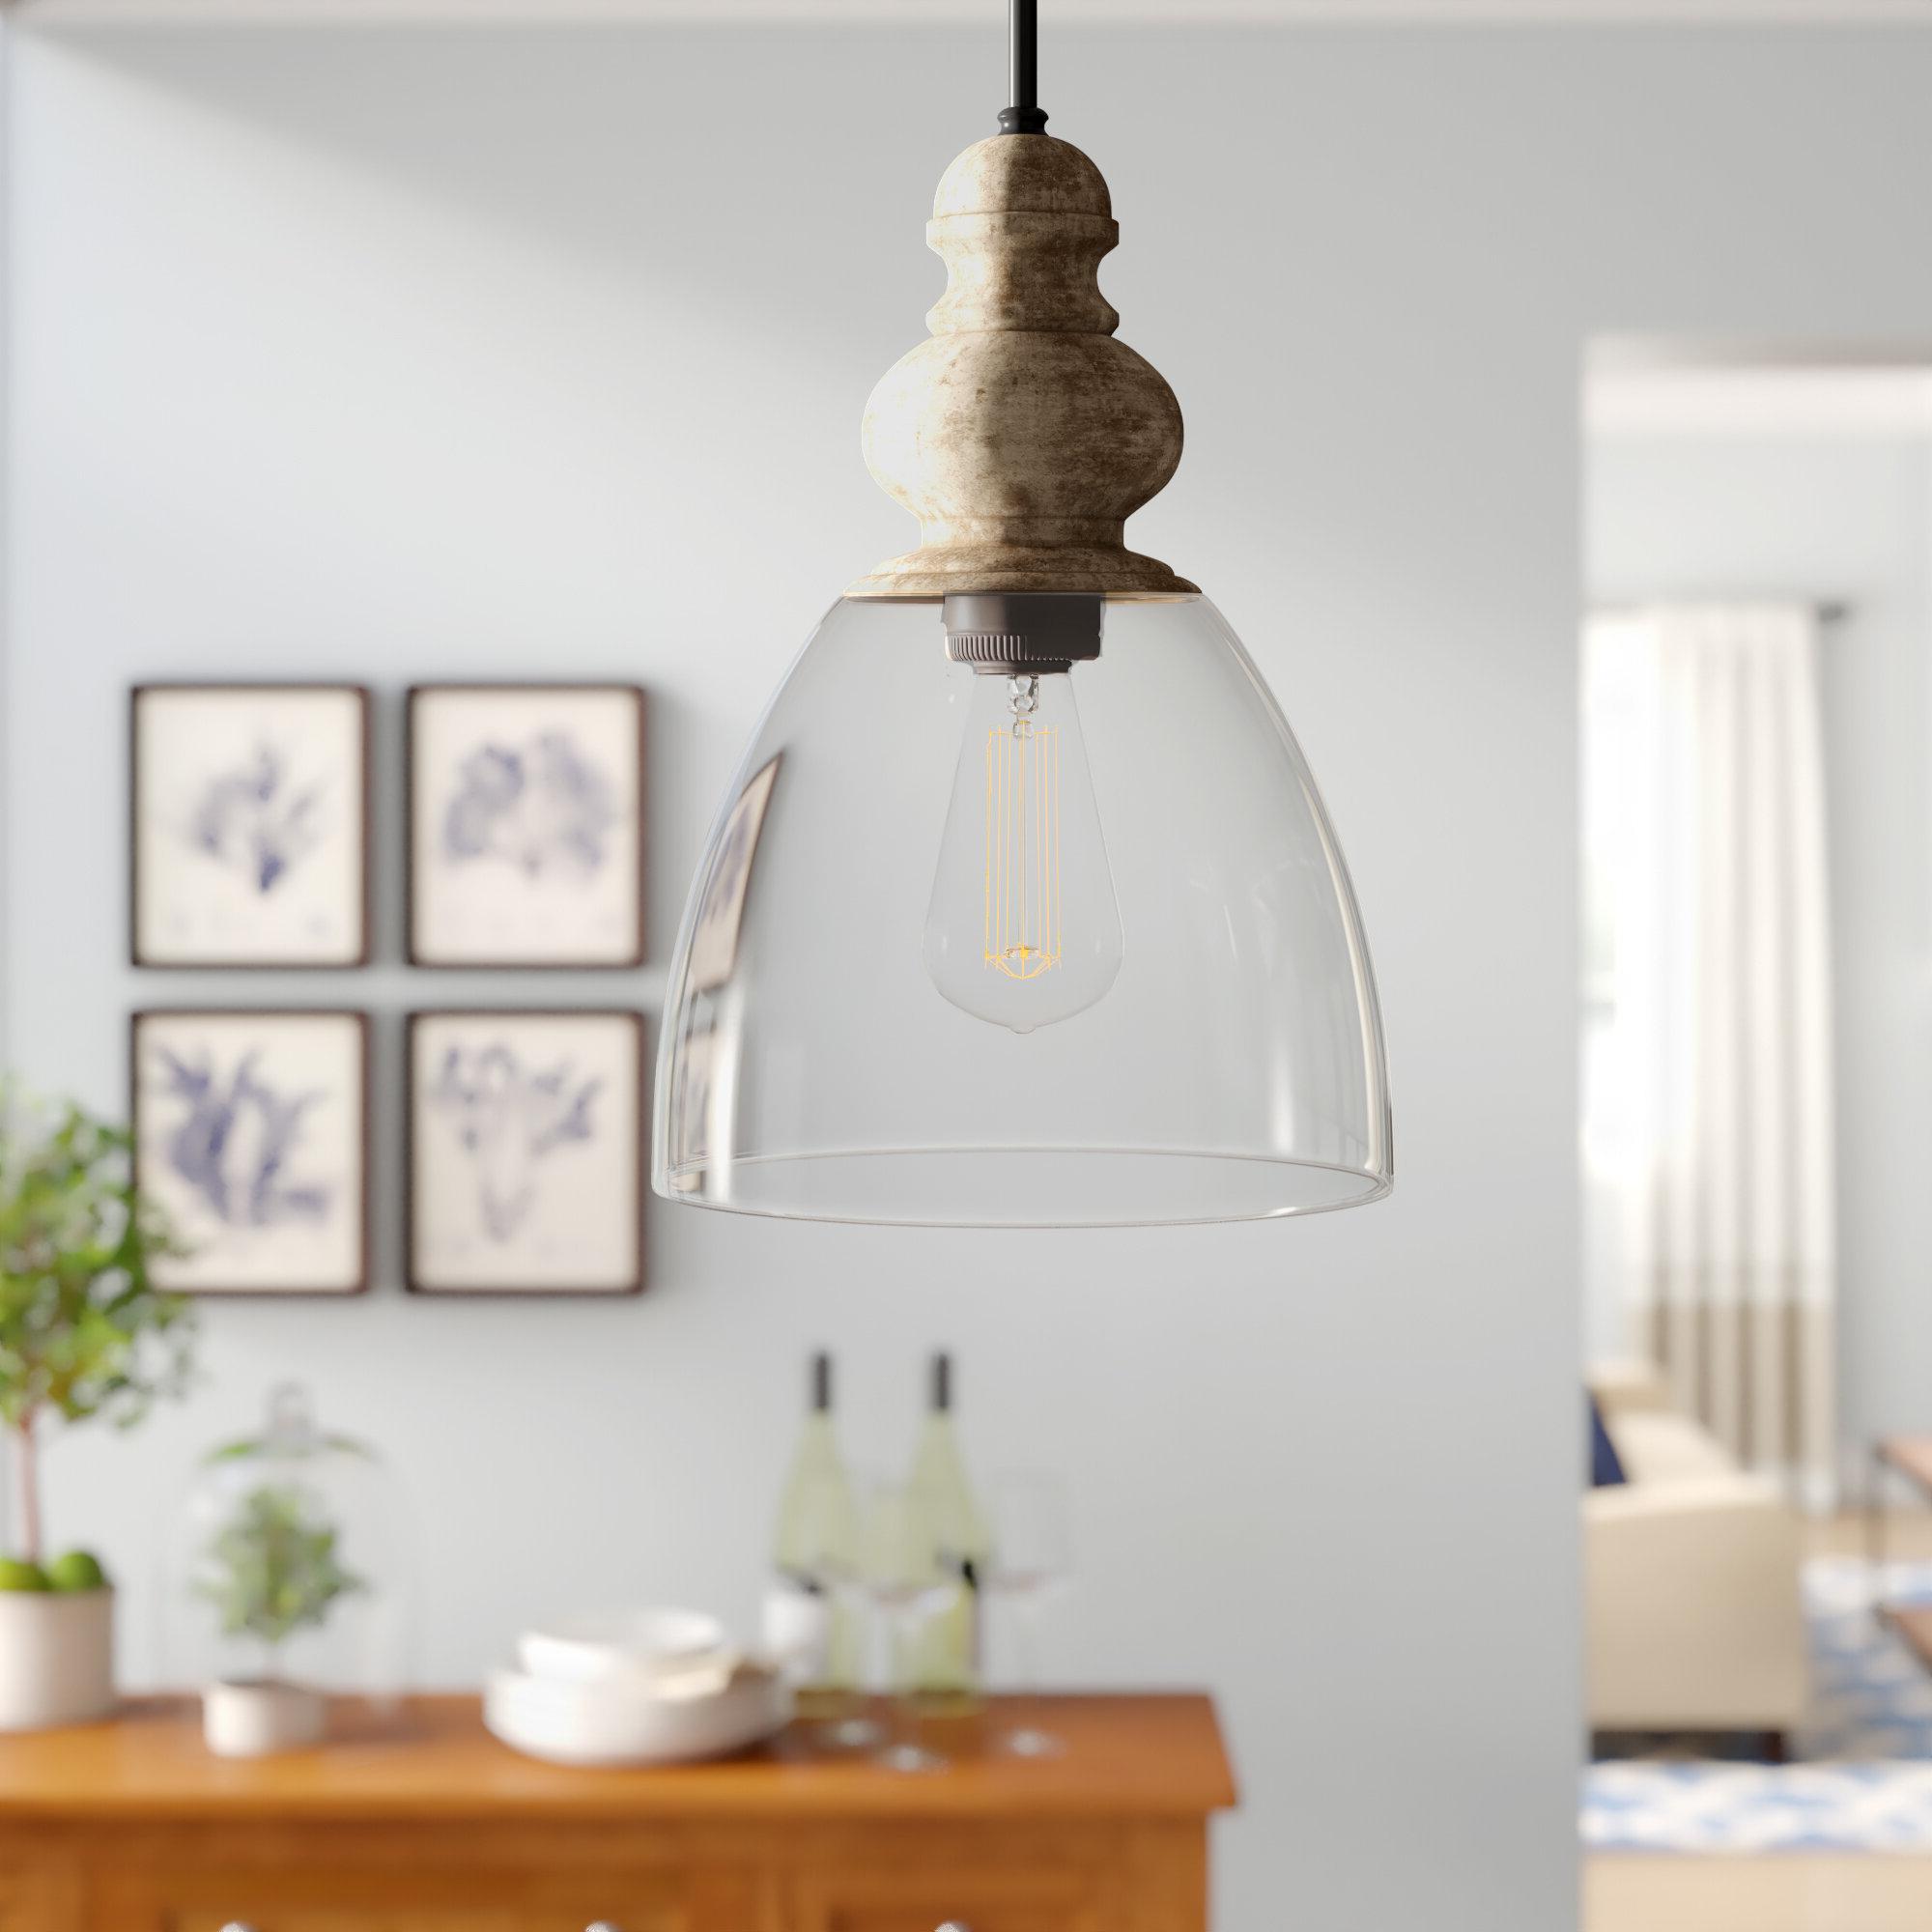 Fashionable Monadnock 1 Light Single Dome Pendants Pertaining To Farmhouse & Rustic Black Pendants (View 19 of 25)